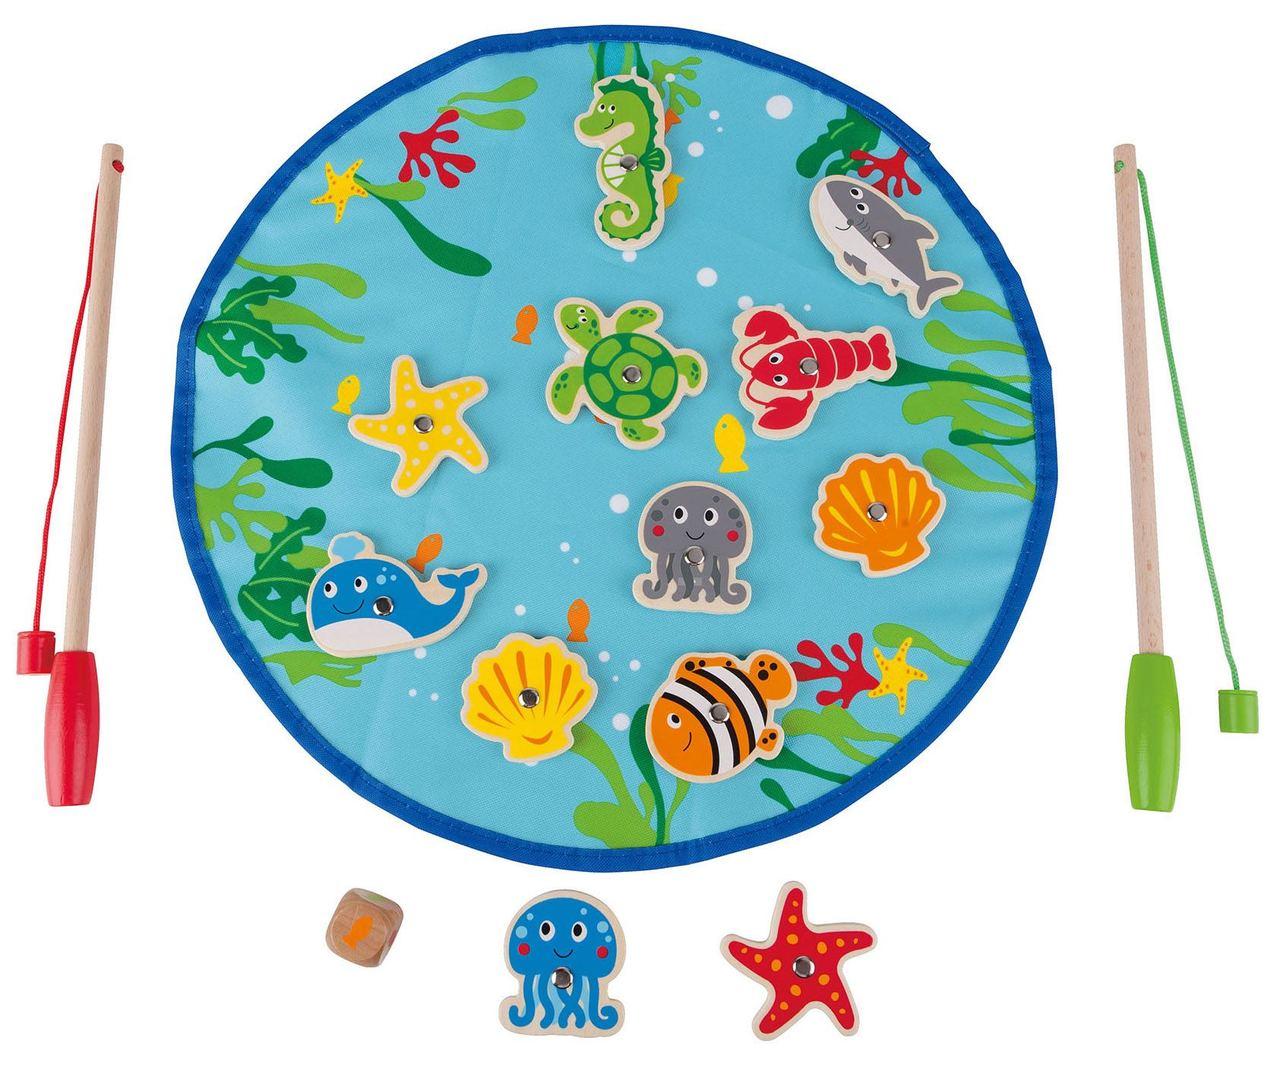 Hape Let\'s Go Fishing Game | Hape Toys Australia | Low Prices Everyday